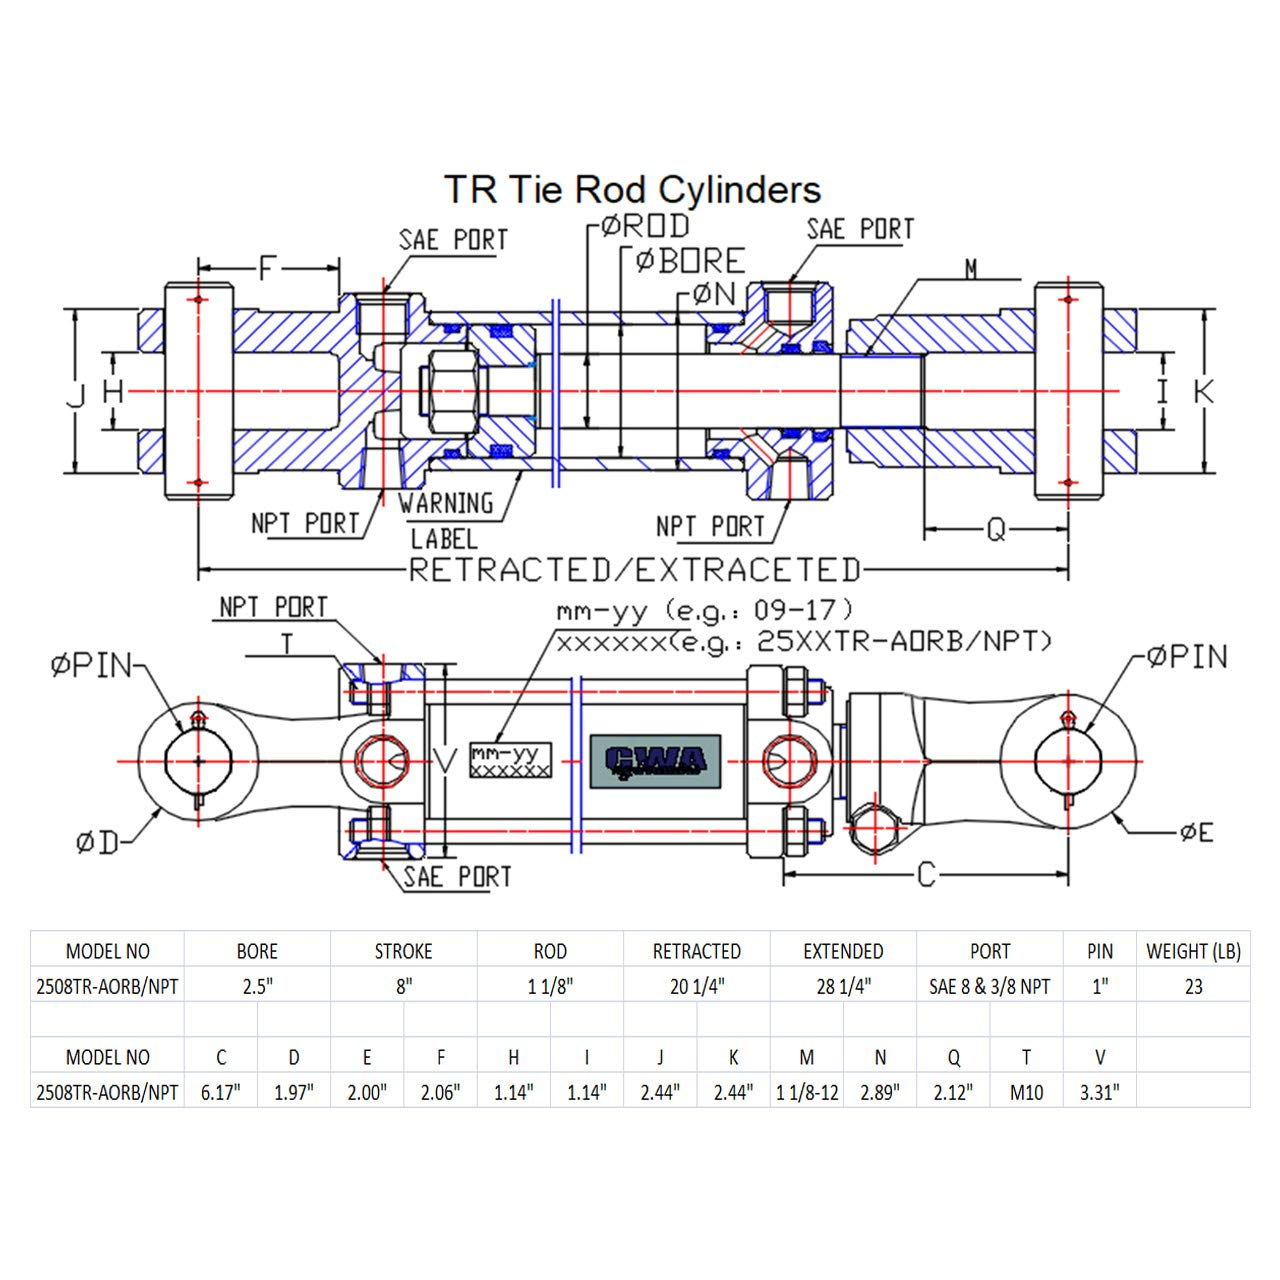 CWA Hydraulics TR Tie Rod Hydraulic Cylinder 2 1//2 Bore x 18 Stroke x 1 1//8 Rod x 2500 PSI Port SAE 8 and 3//8 NPT